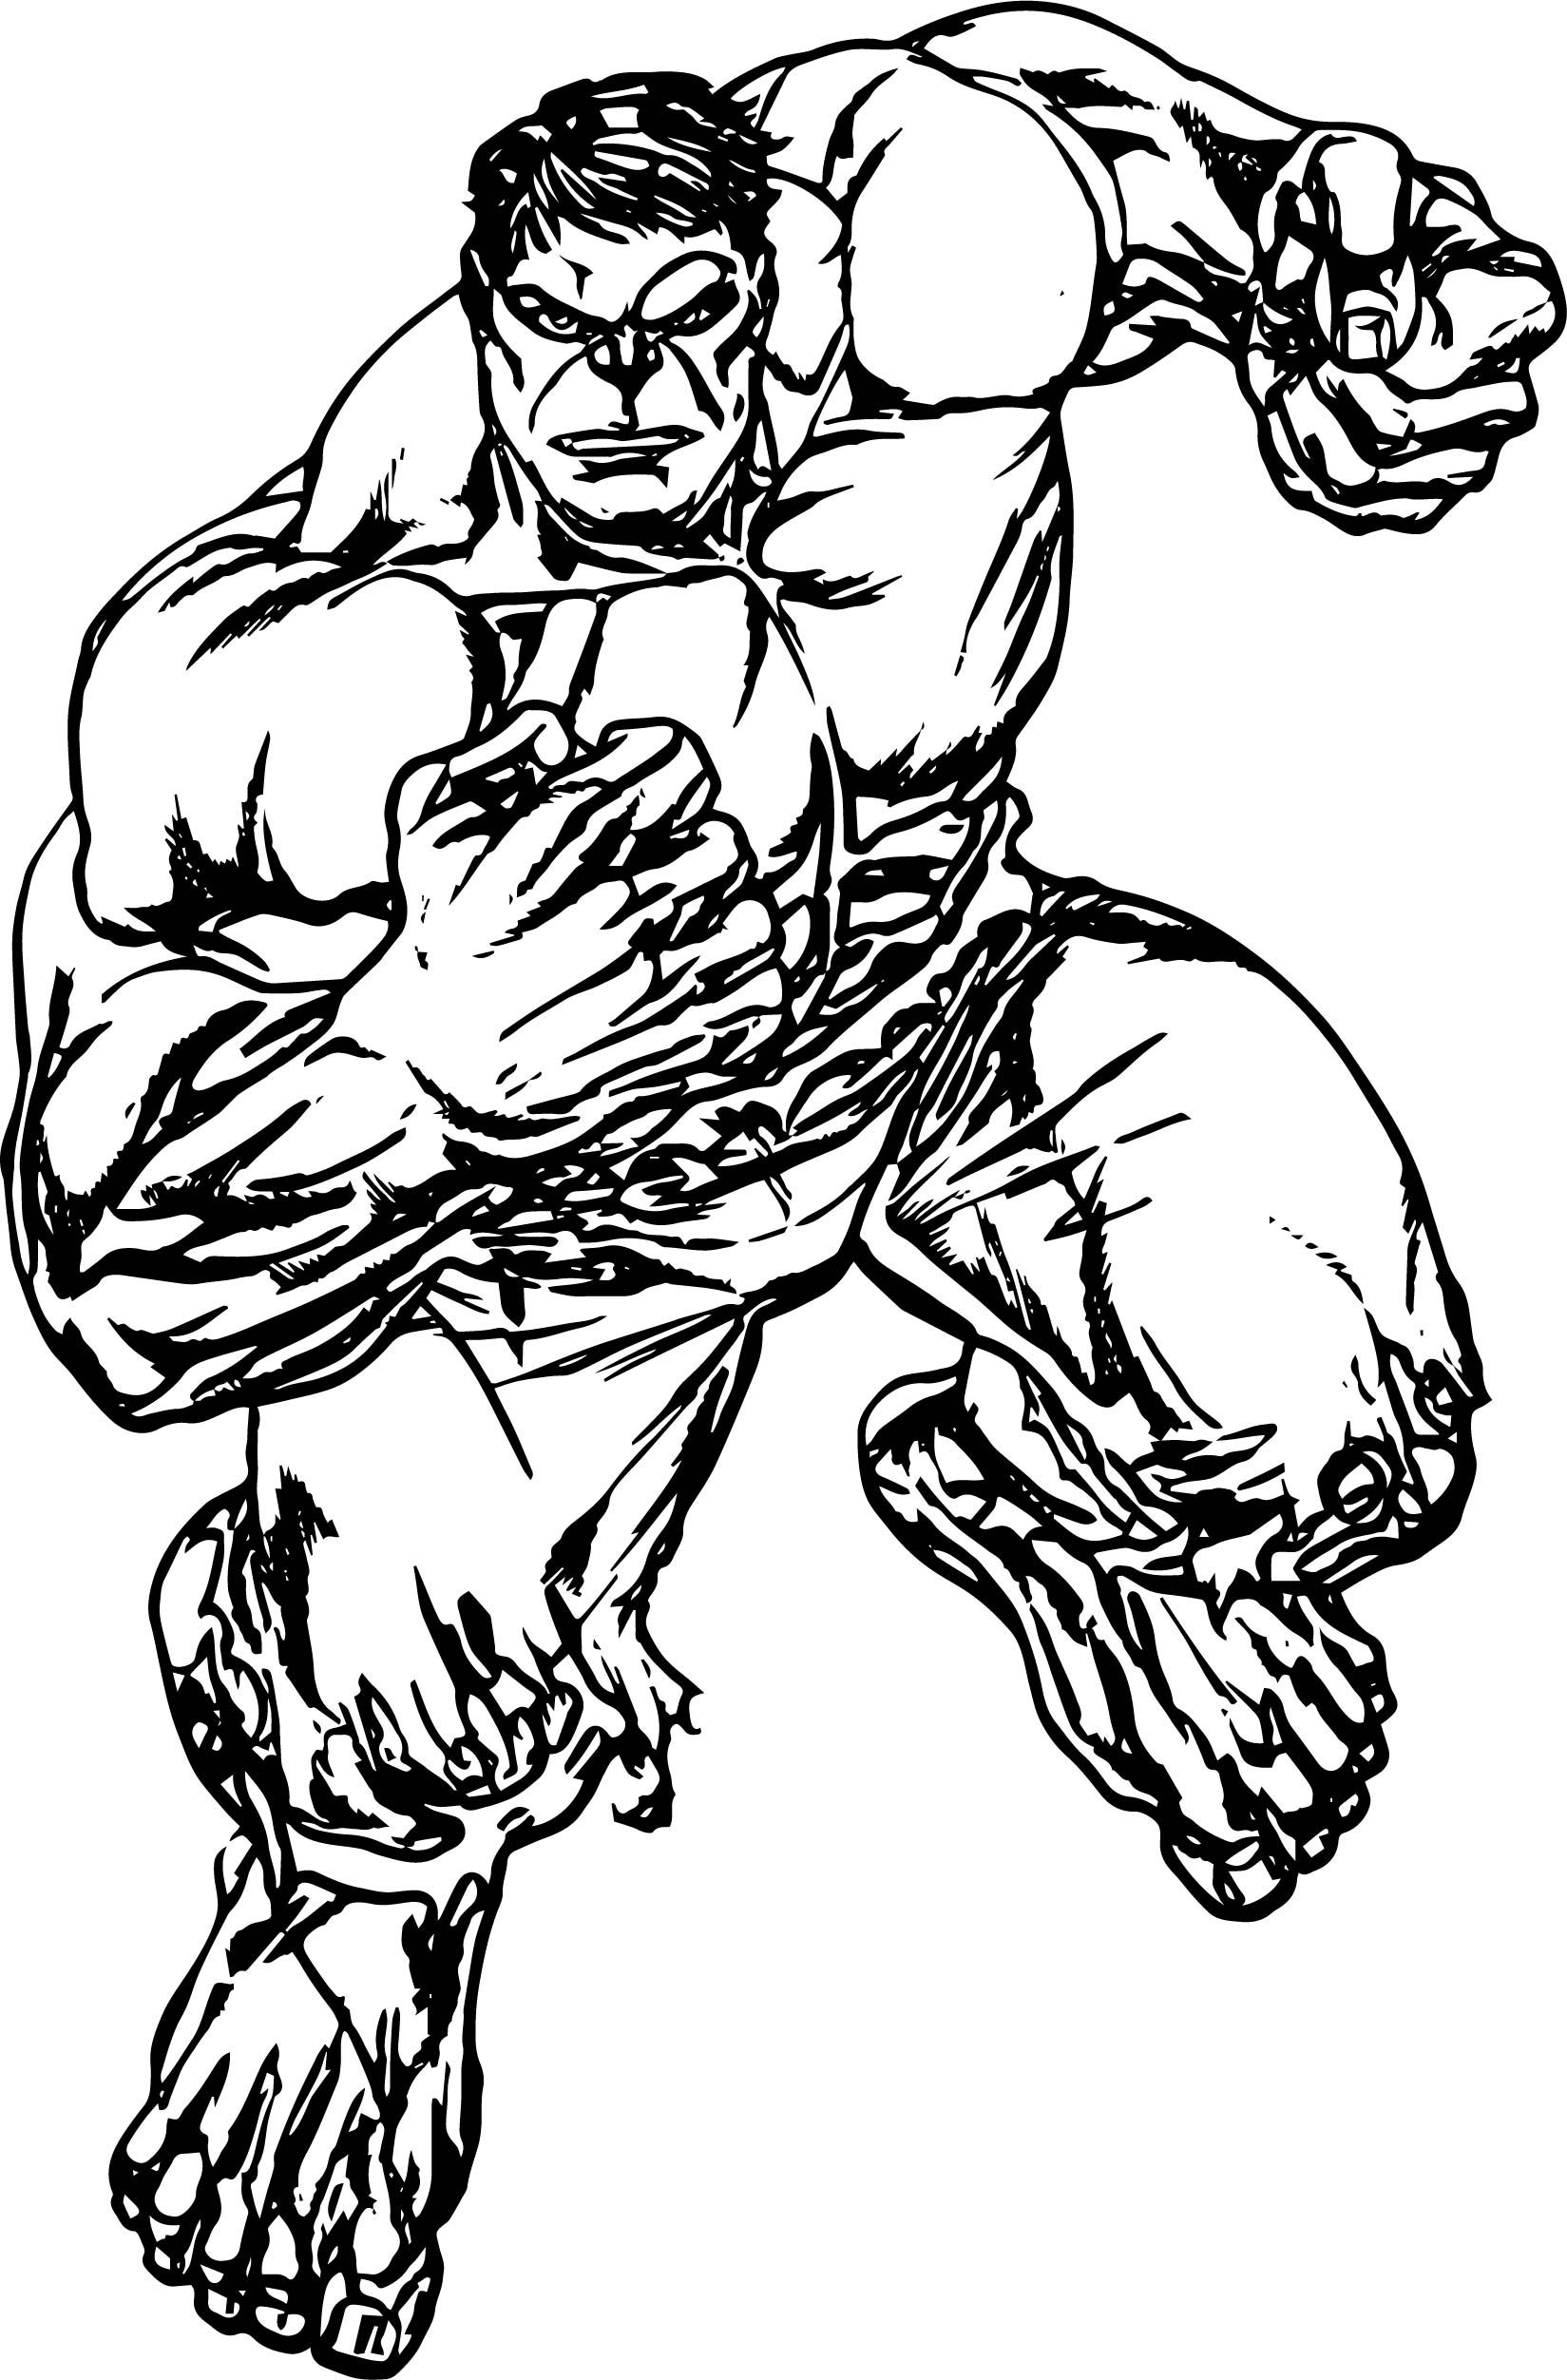 Cool Hulk Avengers Coloring Page Hulk Coloring Pages Avengers Coloring Pages Avengers Coloring